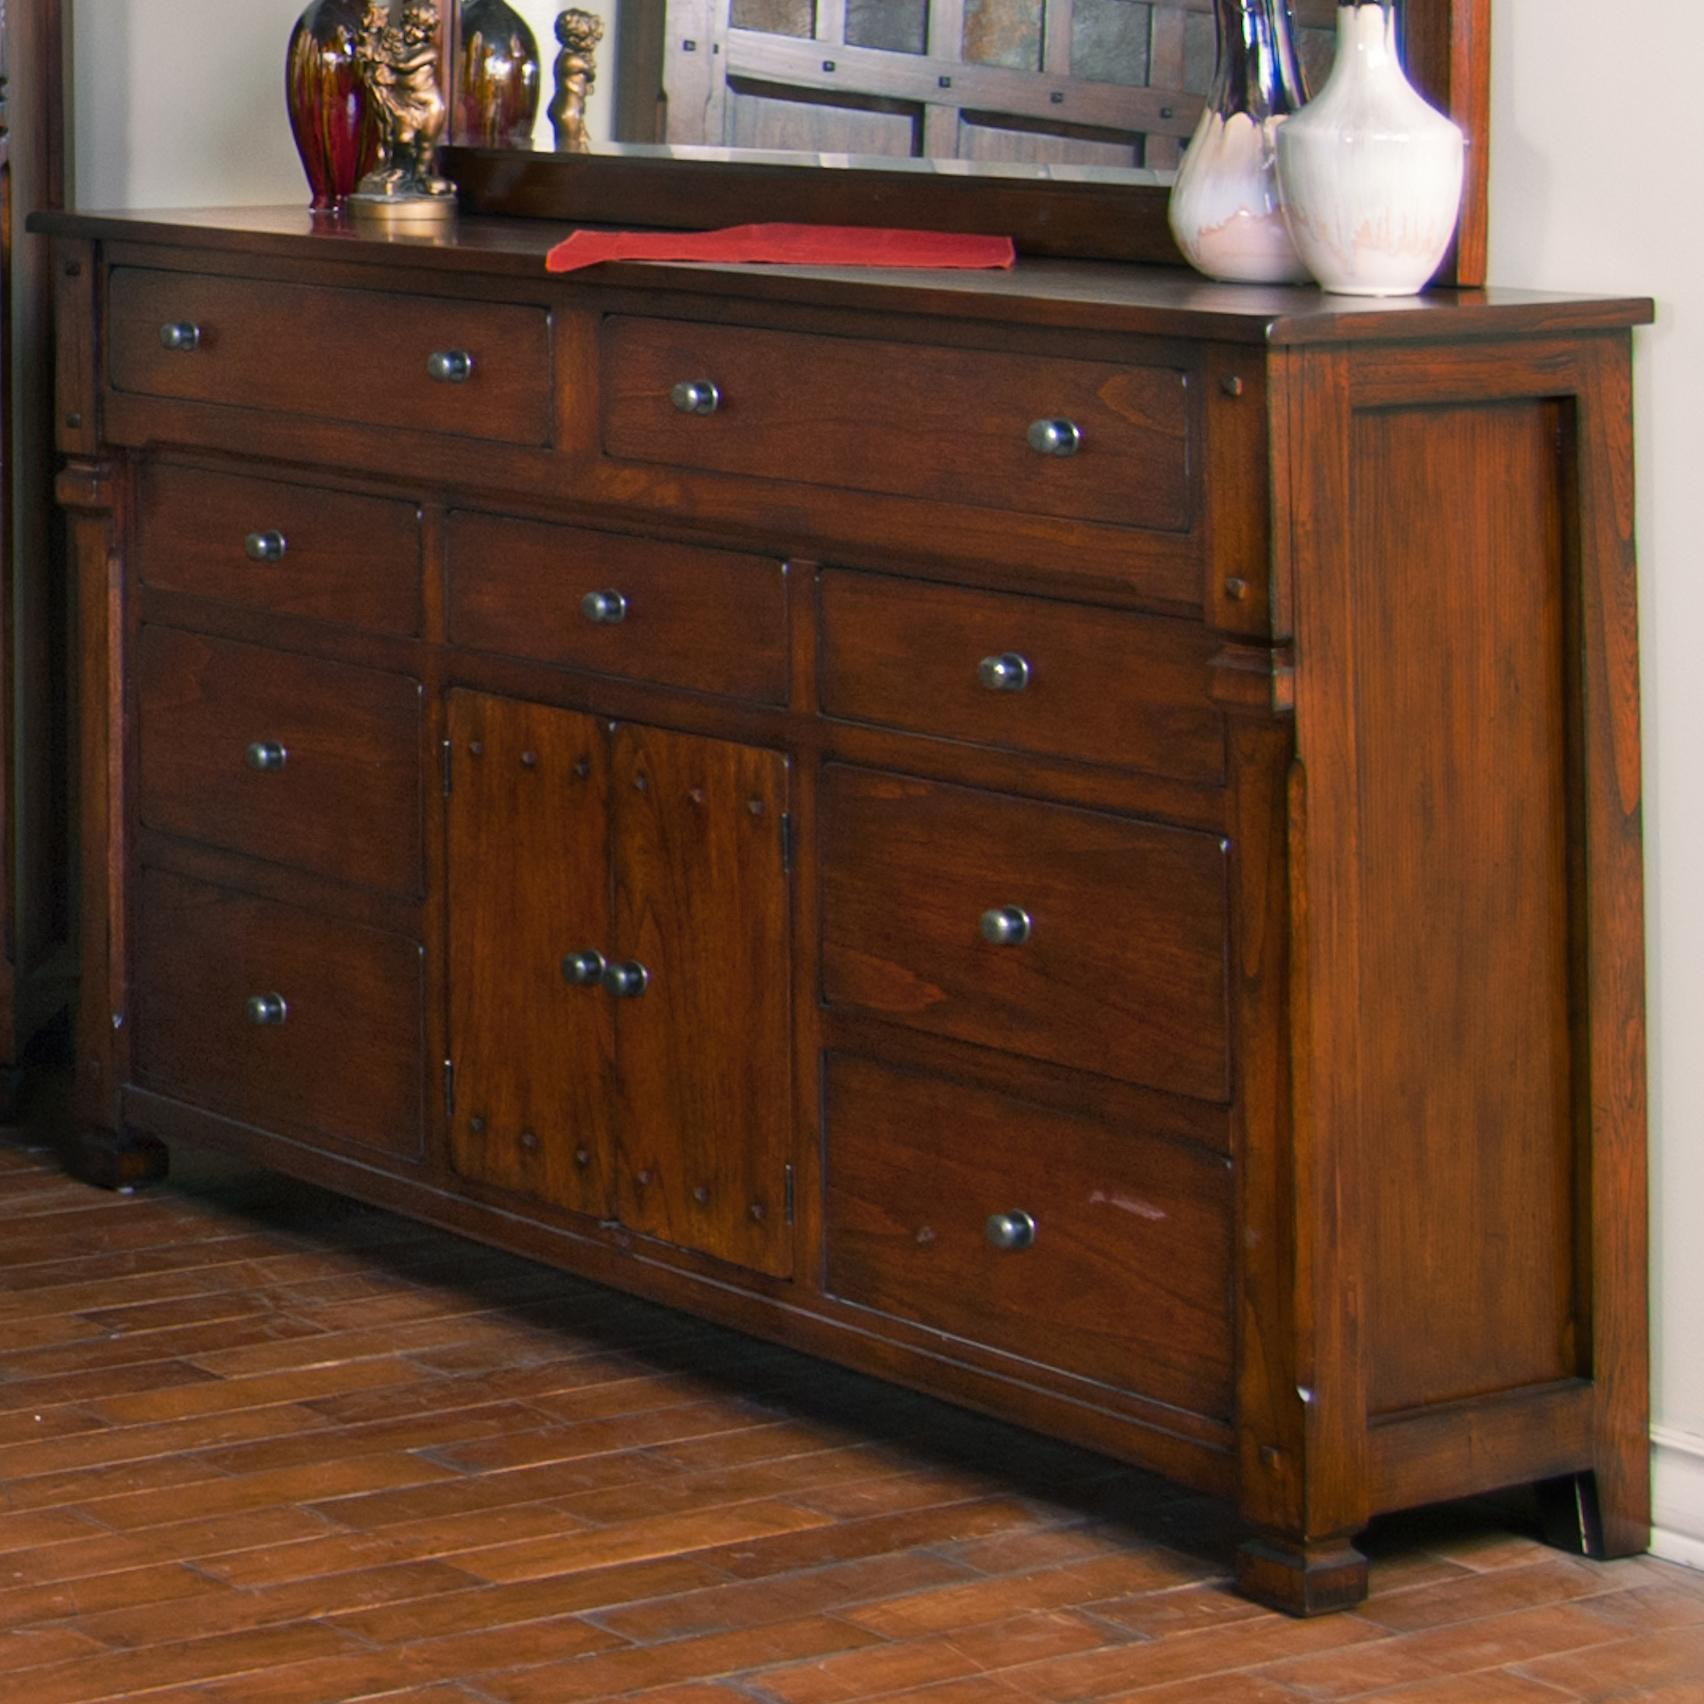 Sunny designs santa fe 9 drawer 2 door dresser fashion furniture dressers for Sunny designs bedroom furniture